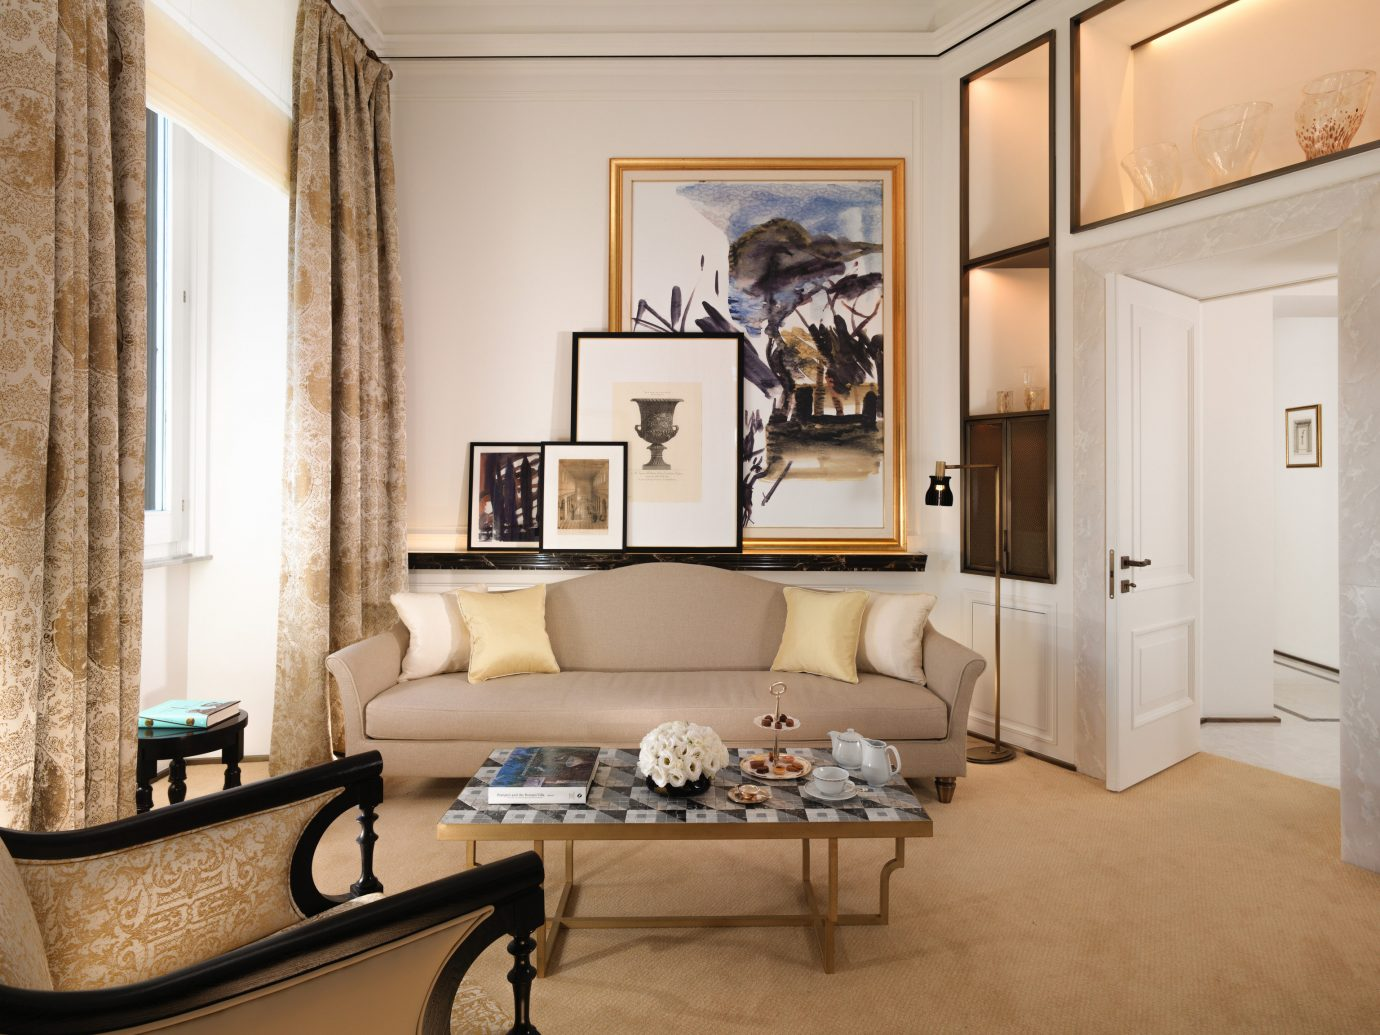 Hotels floor indoor wall living room room furniture Living home interior design dining room wood Design table estate